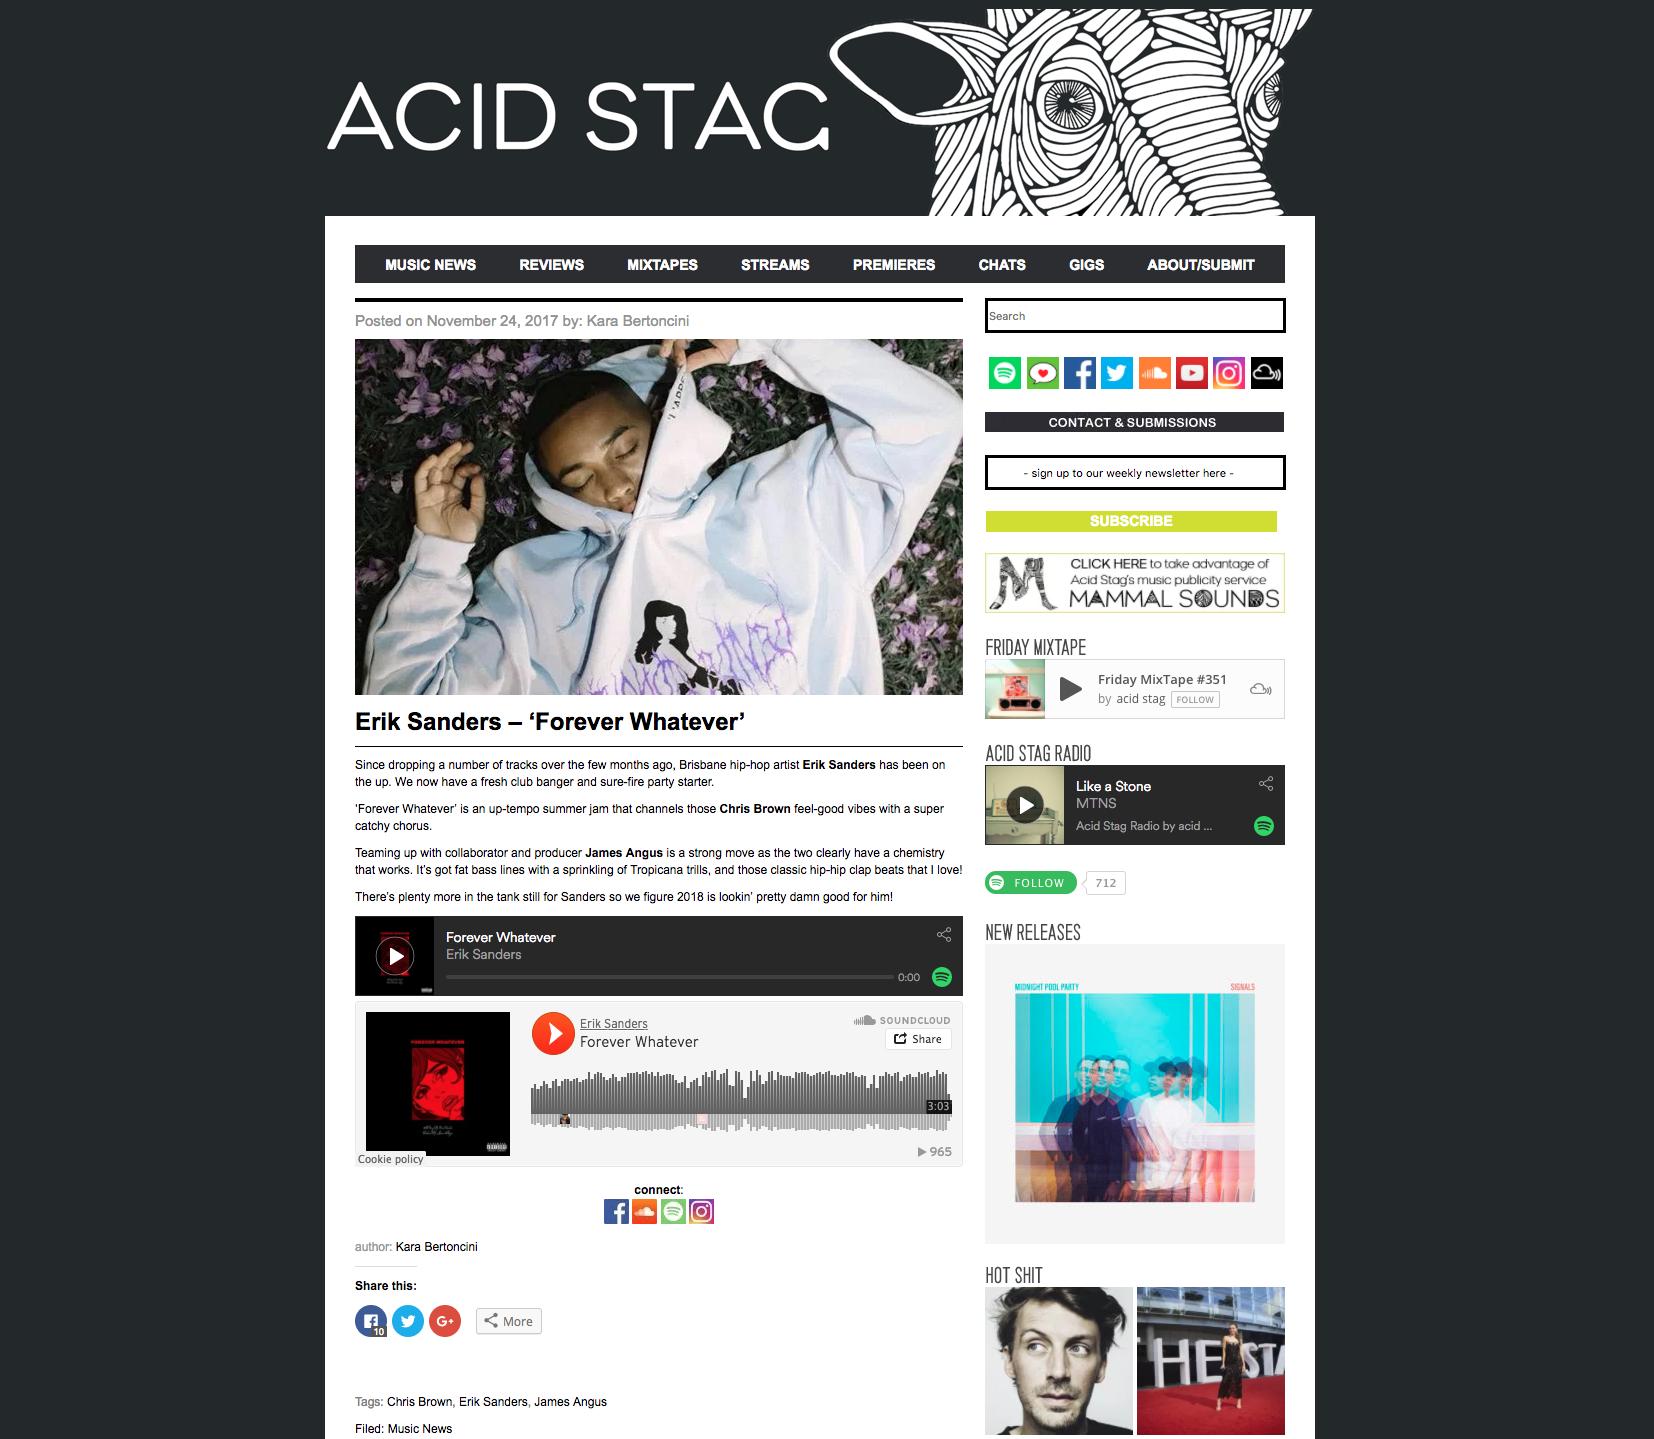 Acid Stag: Music News - November 24th 2017